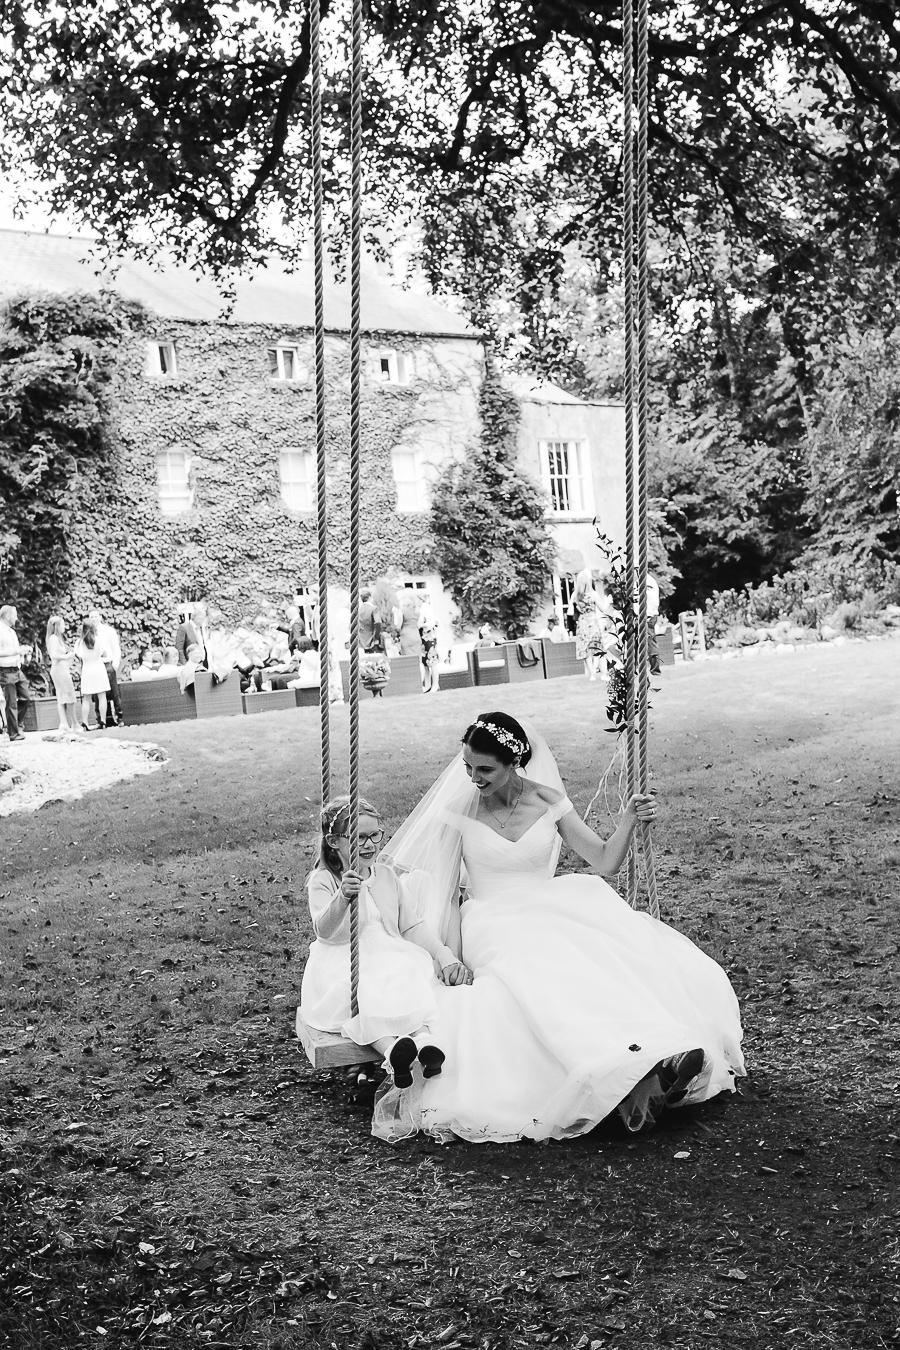 OurBeautifulAdventure-FairyhillWedding-John&Zoe-WeddingBlog-2.jpg